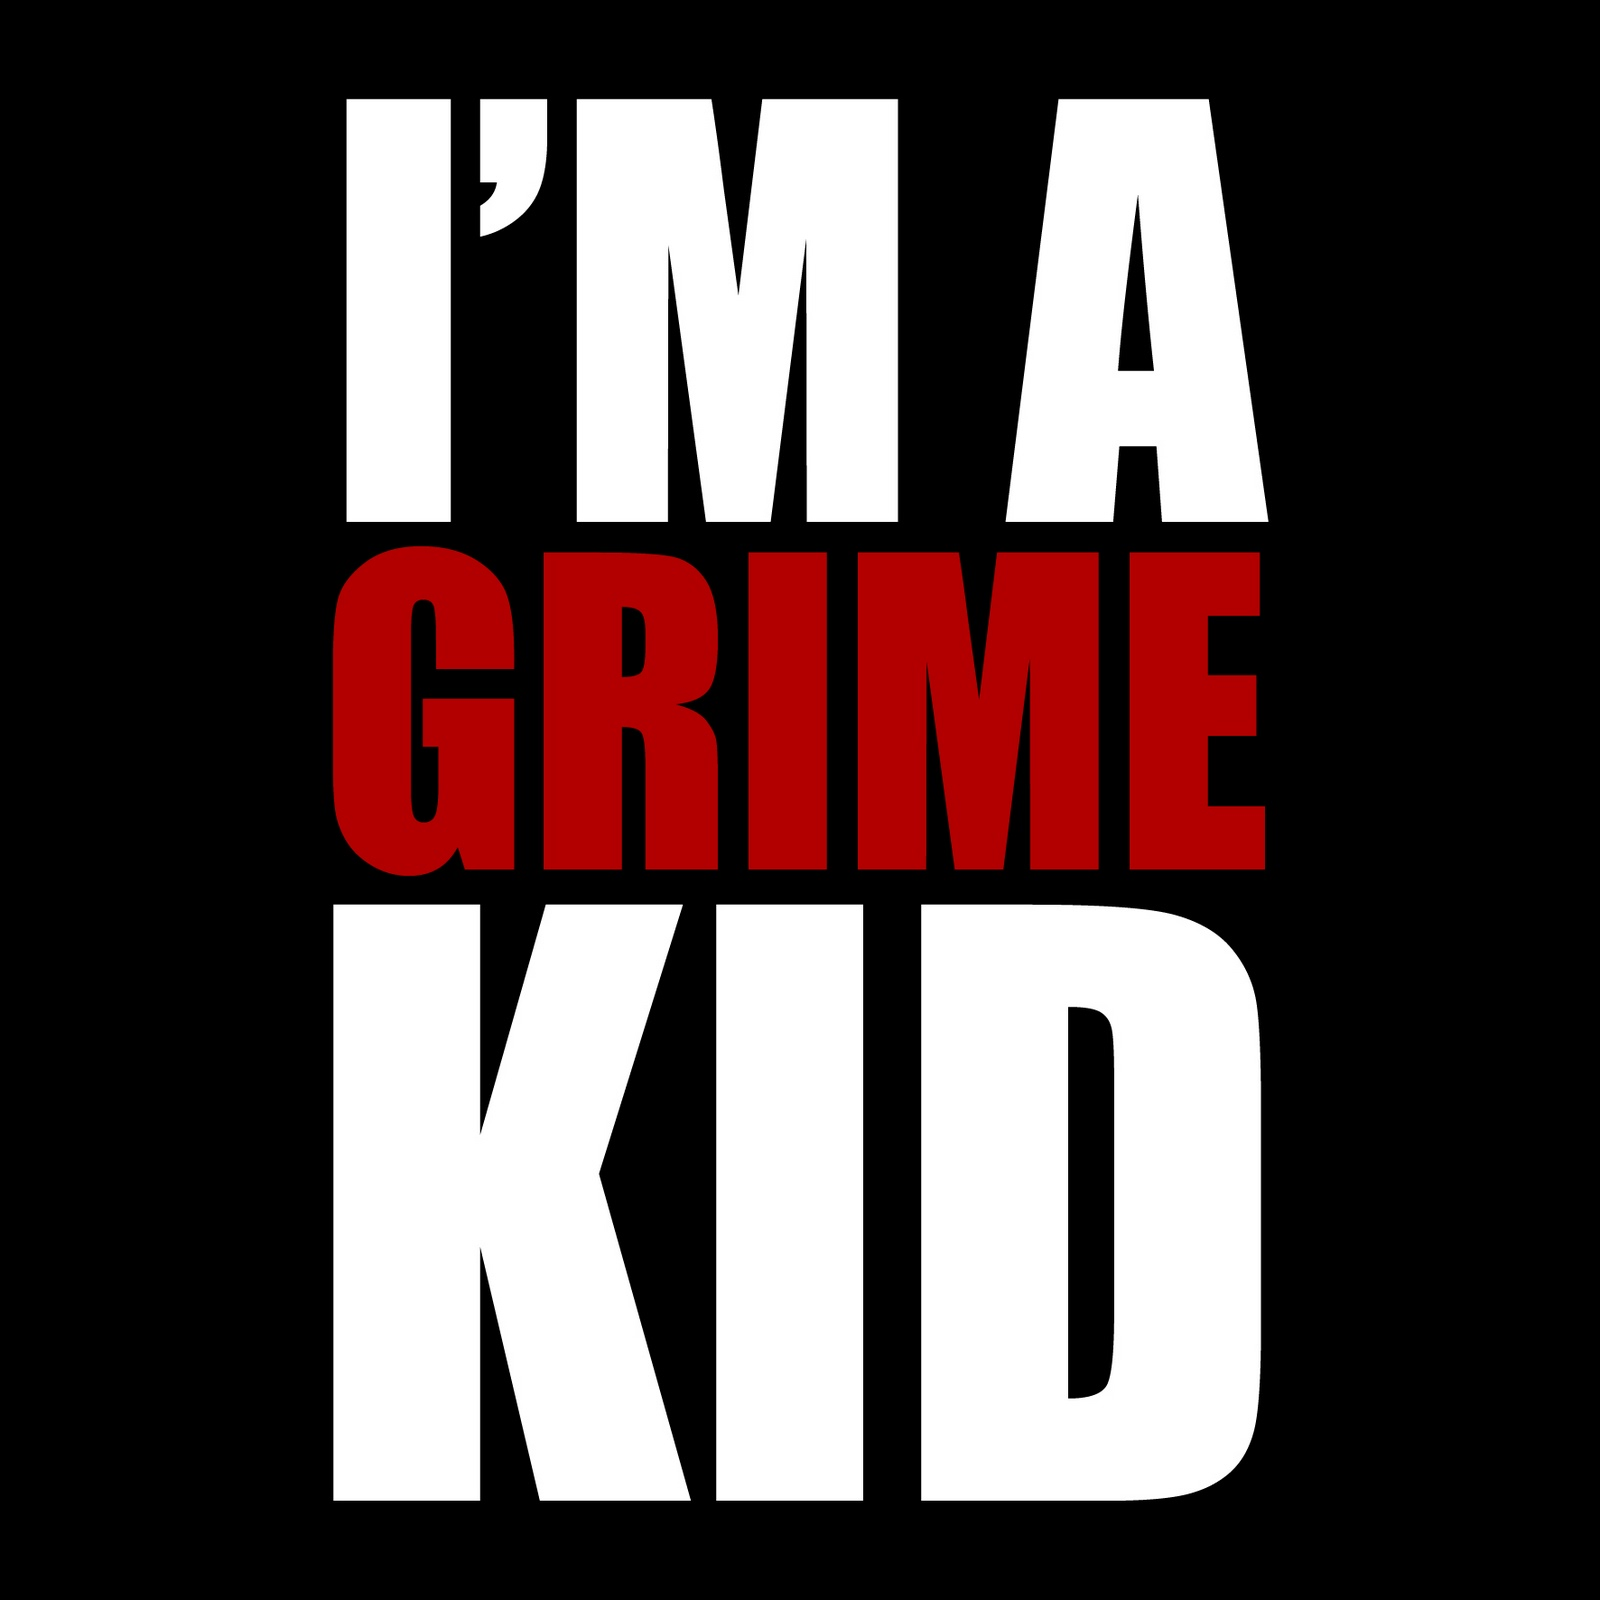 http://2.bp.blogspot.com/_uj56ppwWIlg/TQHGx_4CfSI/AAAAAAAAABw/IEorguhercg/s1600/Grime+Kid.jpg